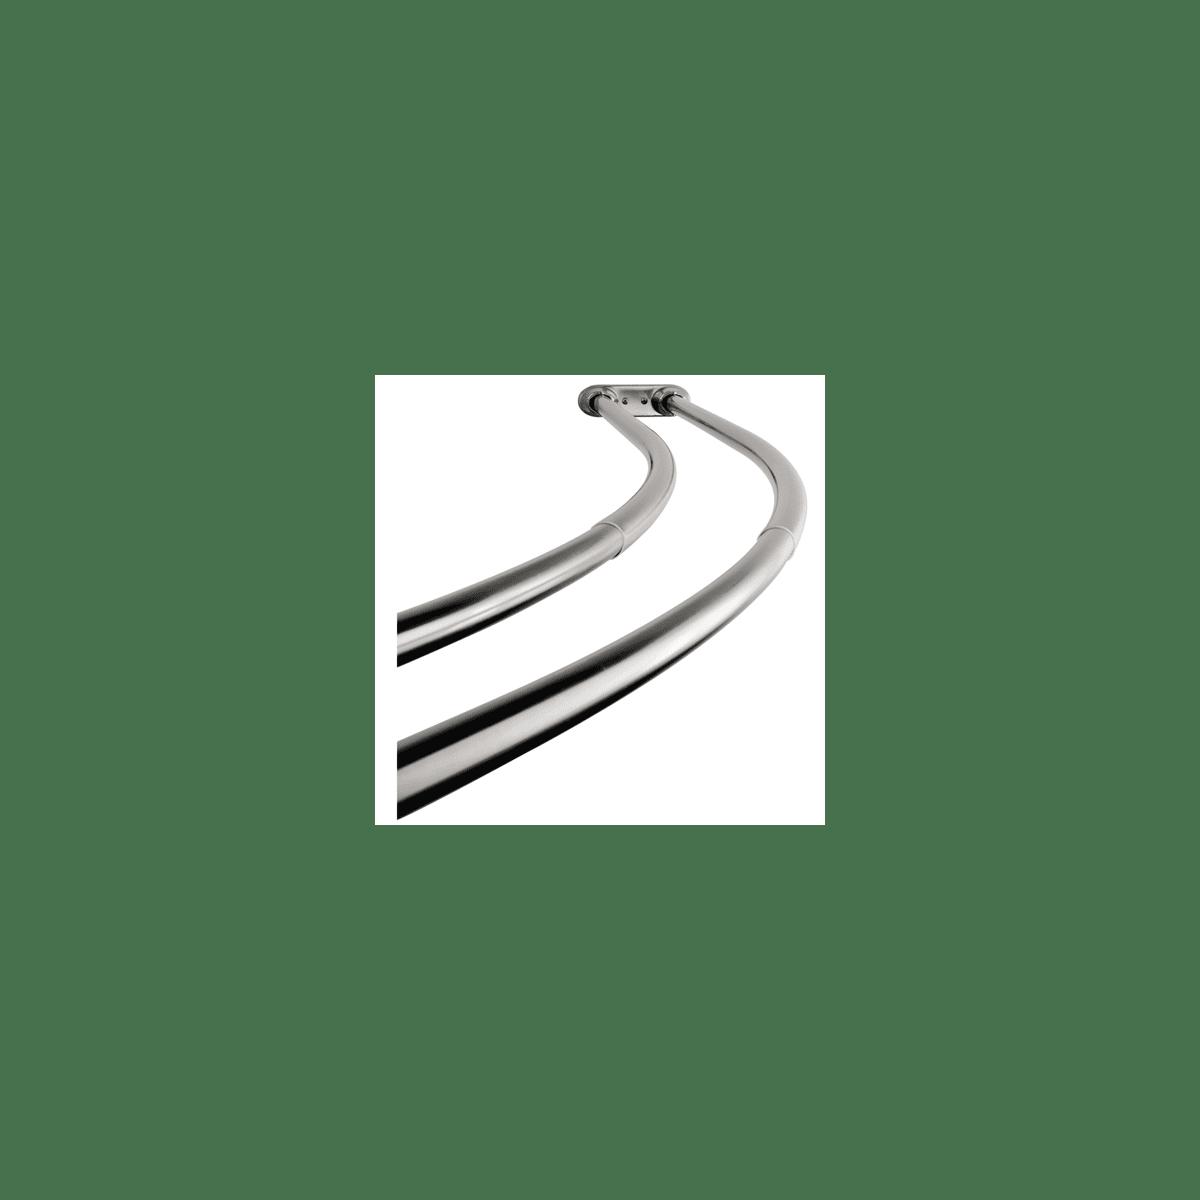 Kingston Brass Ccd2171 Polished Chrome 60 72 Adjustable